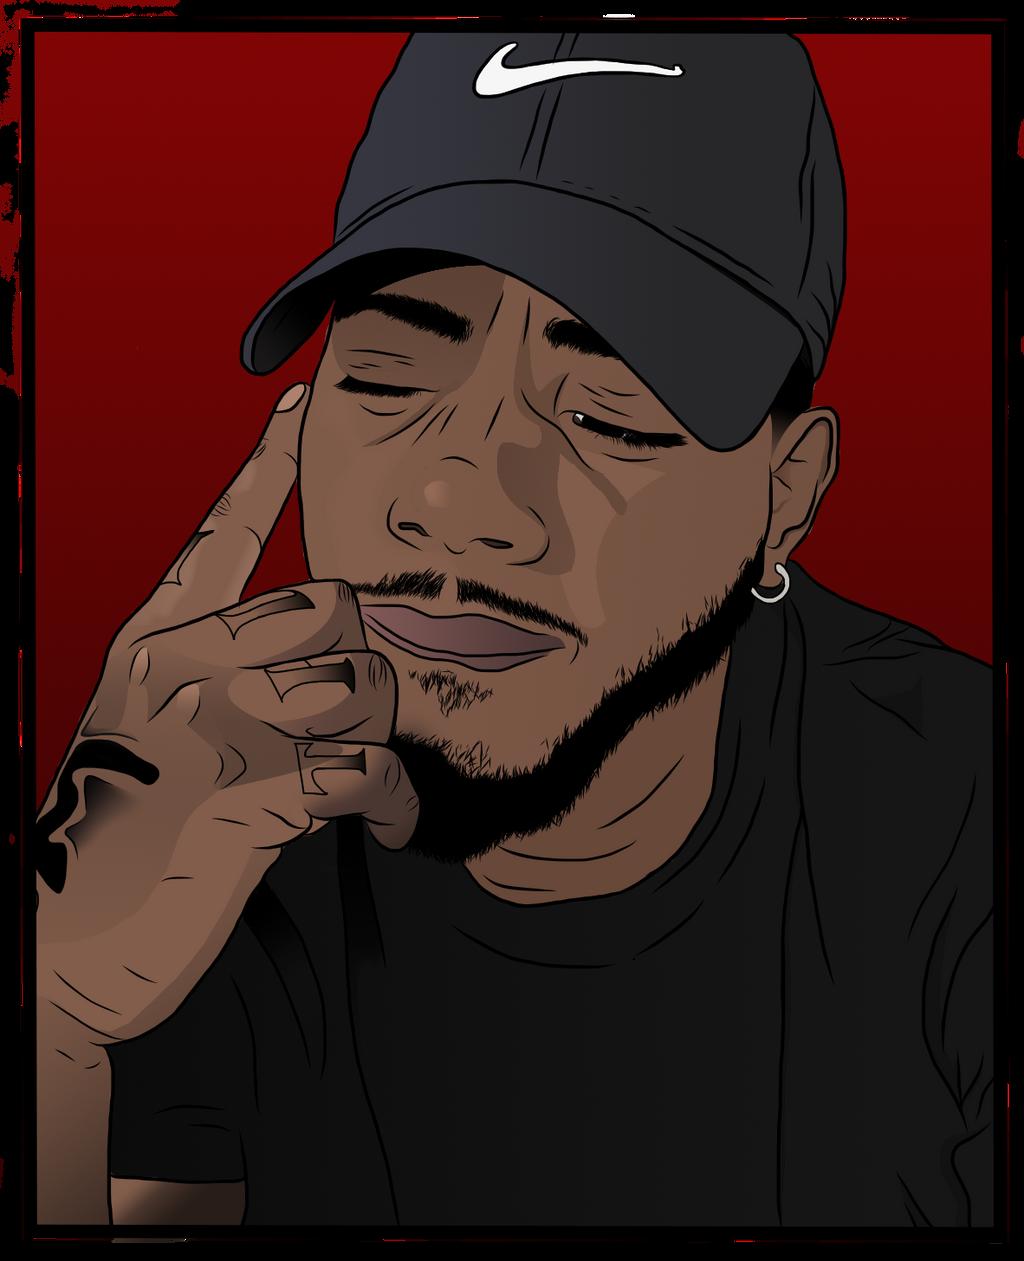 Singer Rapper by TheHoodgirl on DeviantArt